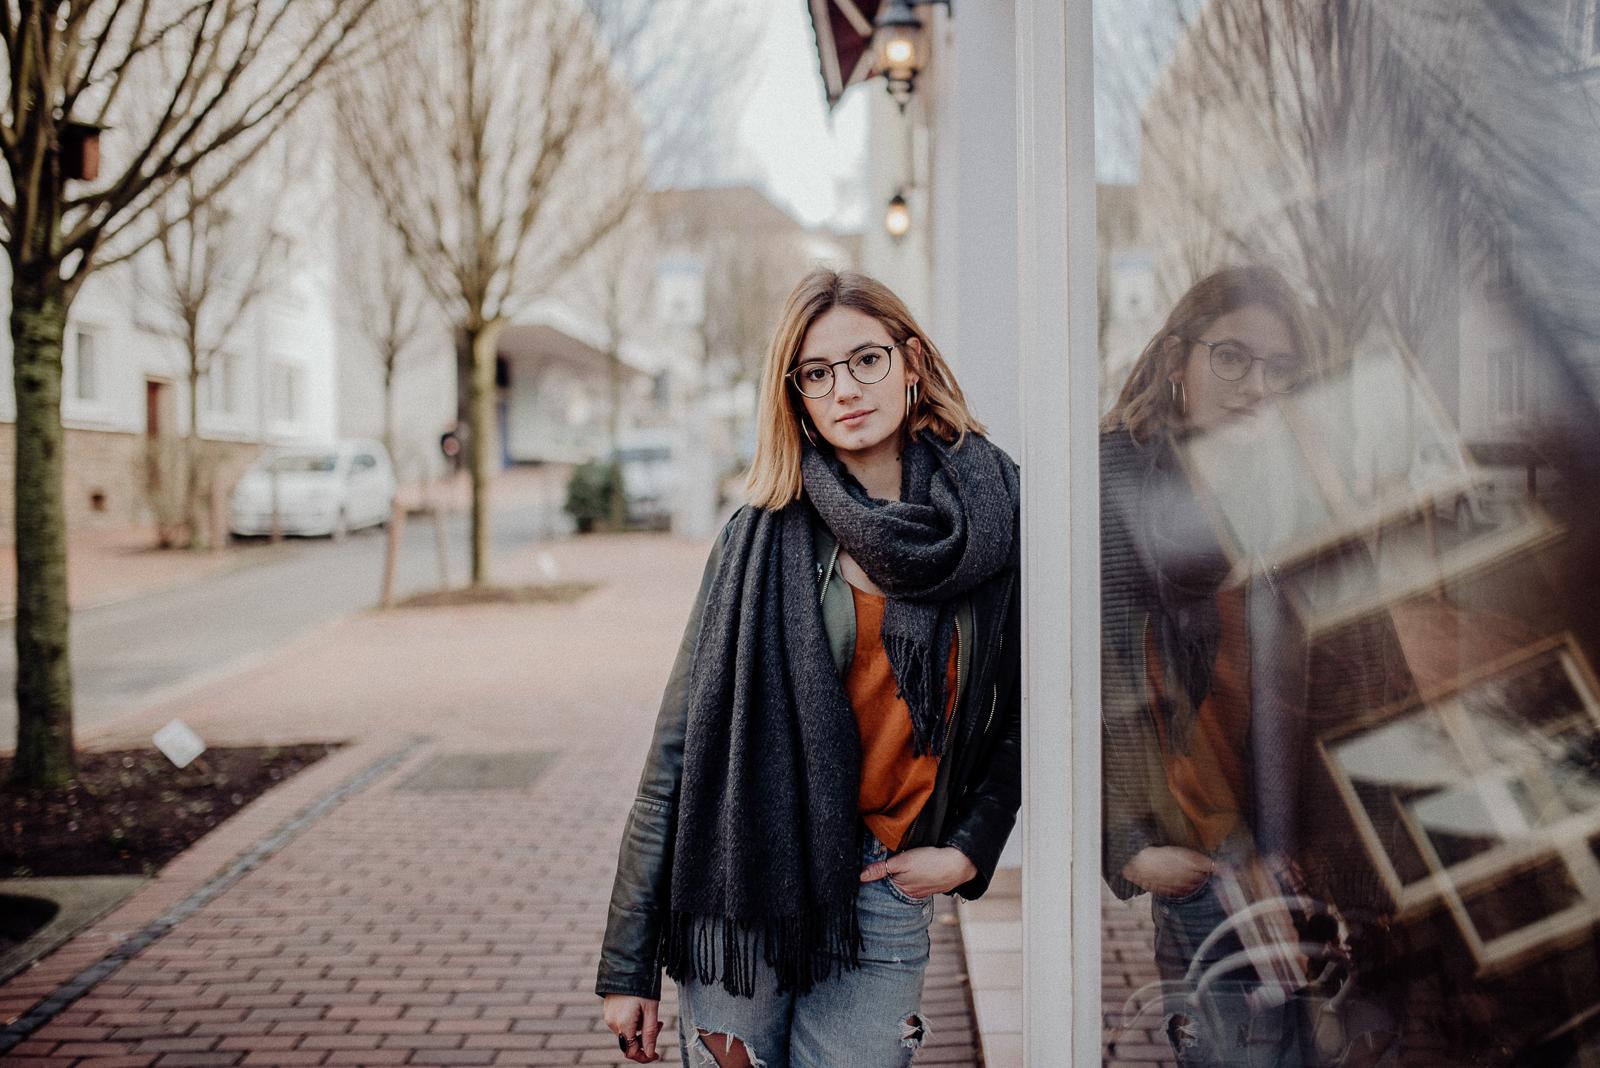 034-designparaplus-fotografin-witten-portrait-shooting-downtown